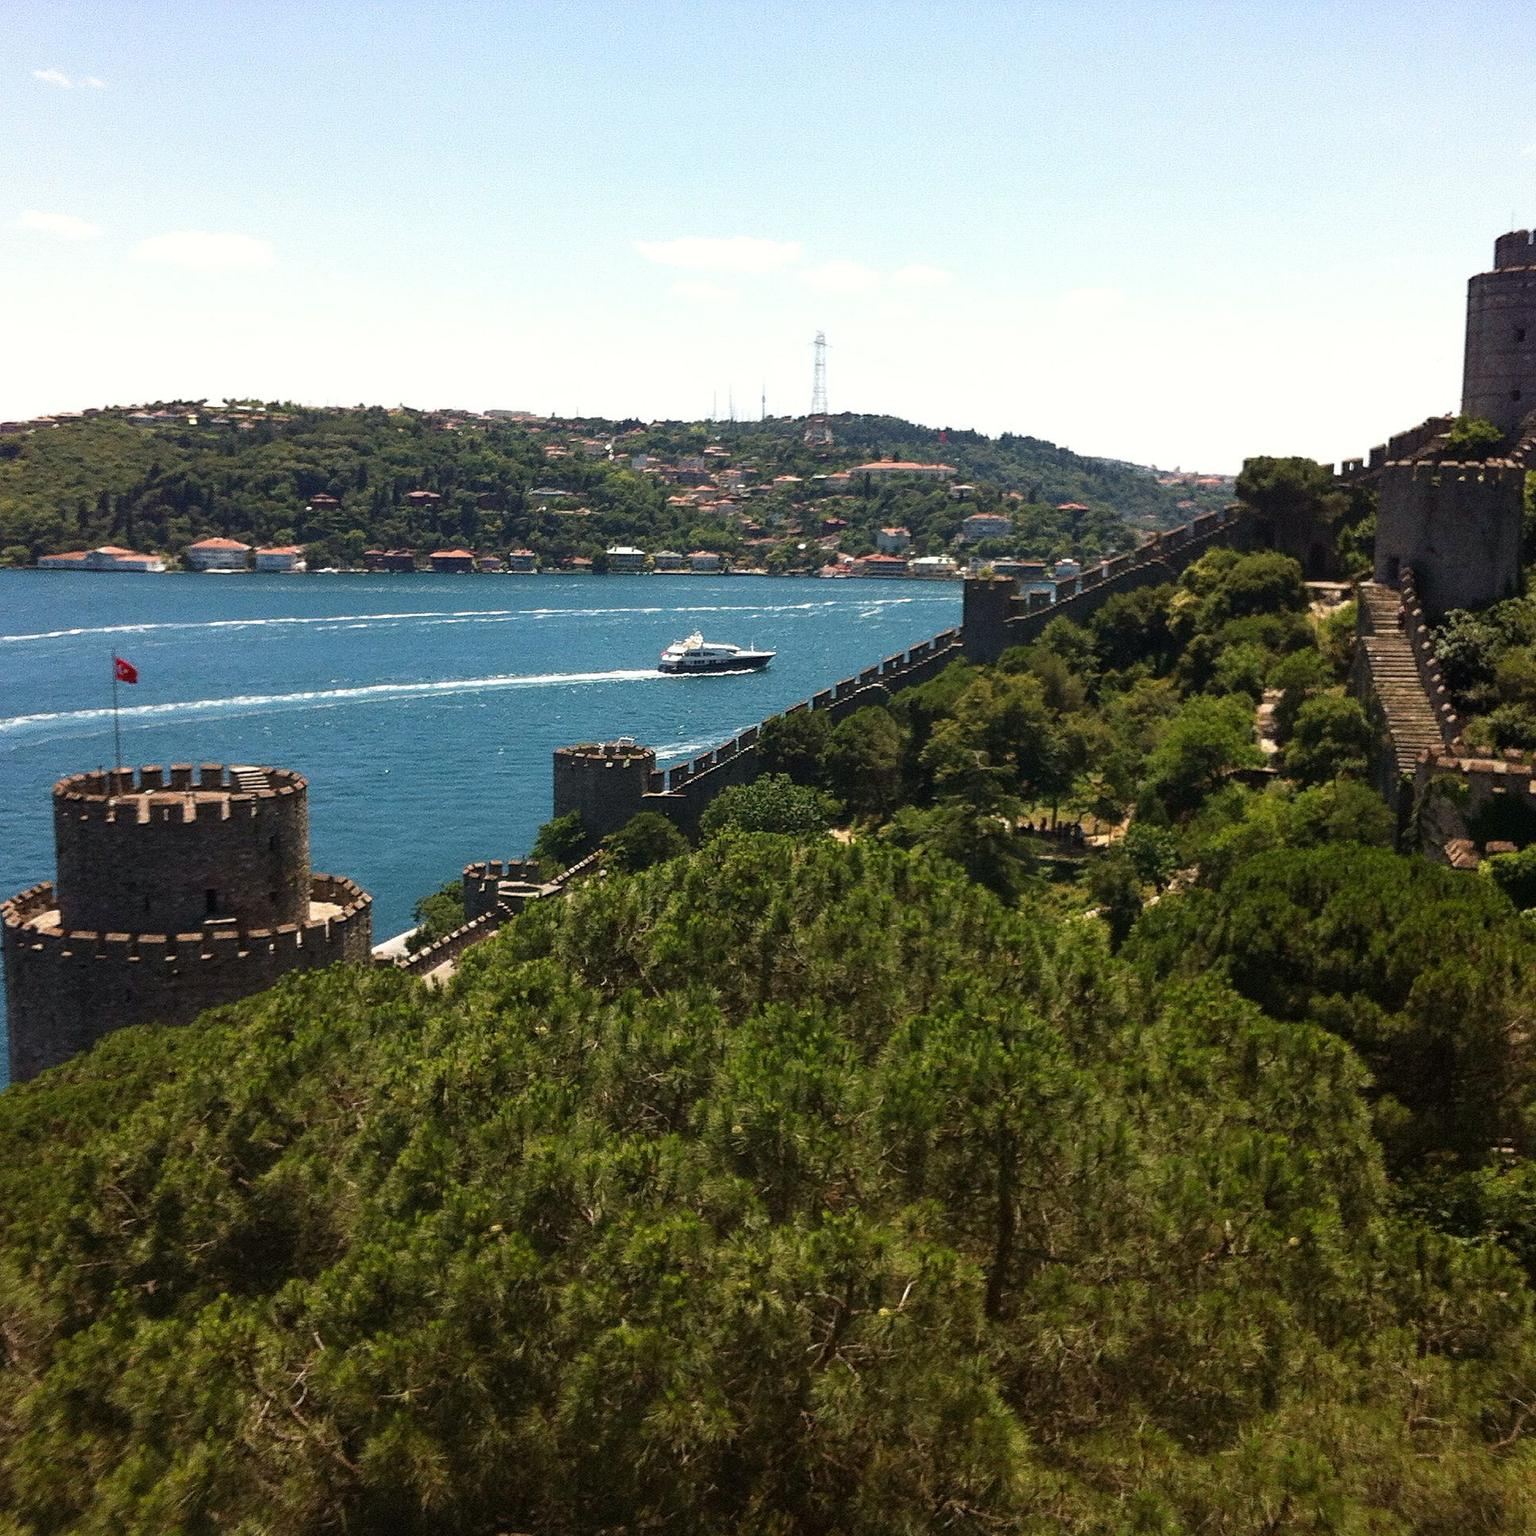 MAIS FOTOS, Bosphorus Strait and Black Sea Day Cruise, saindo de Stambul